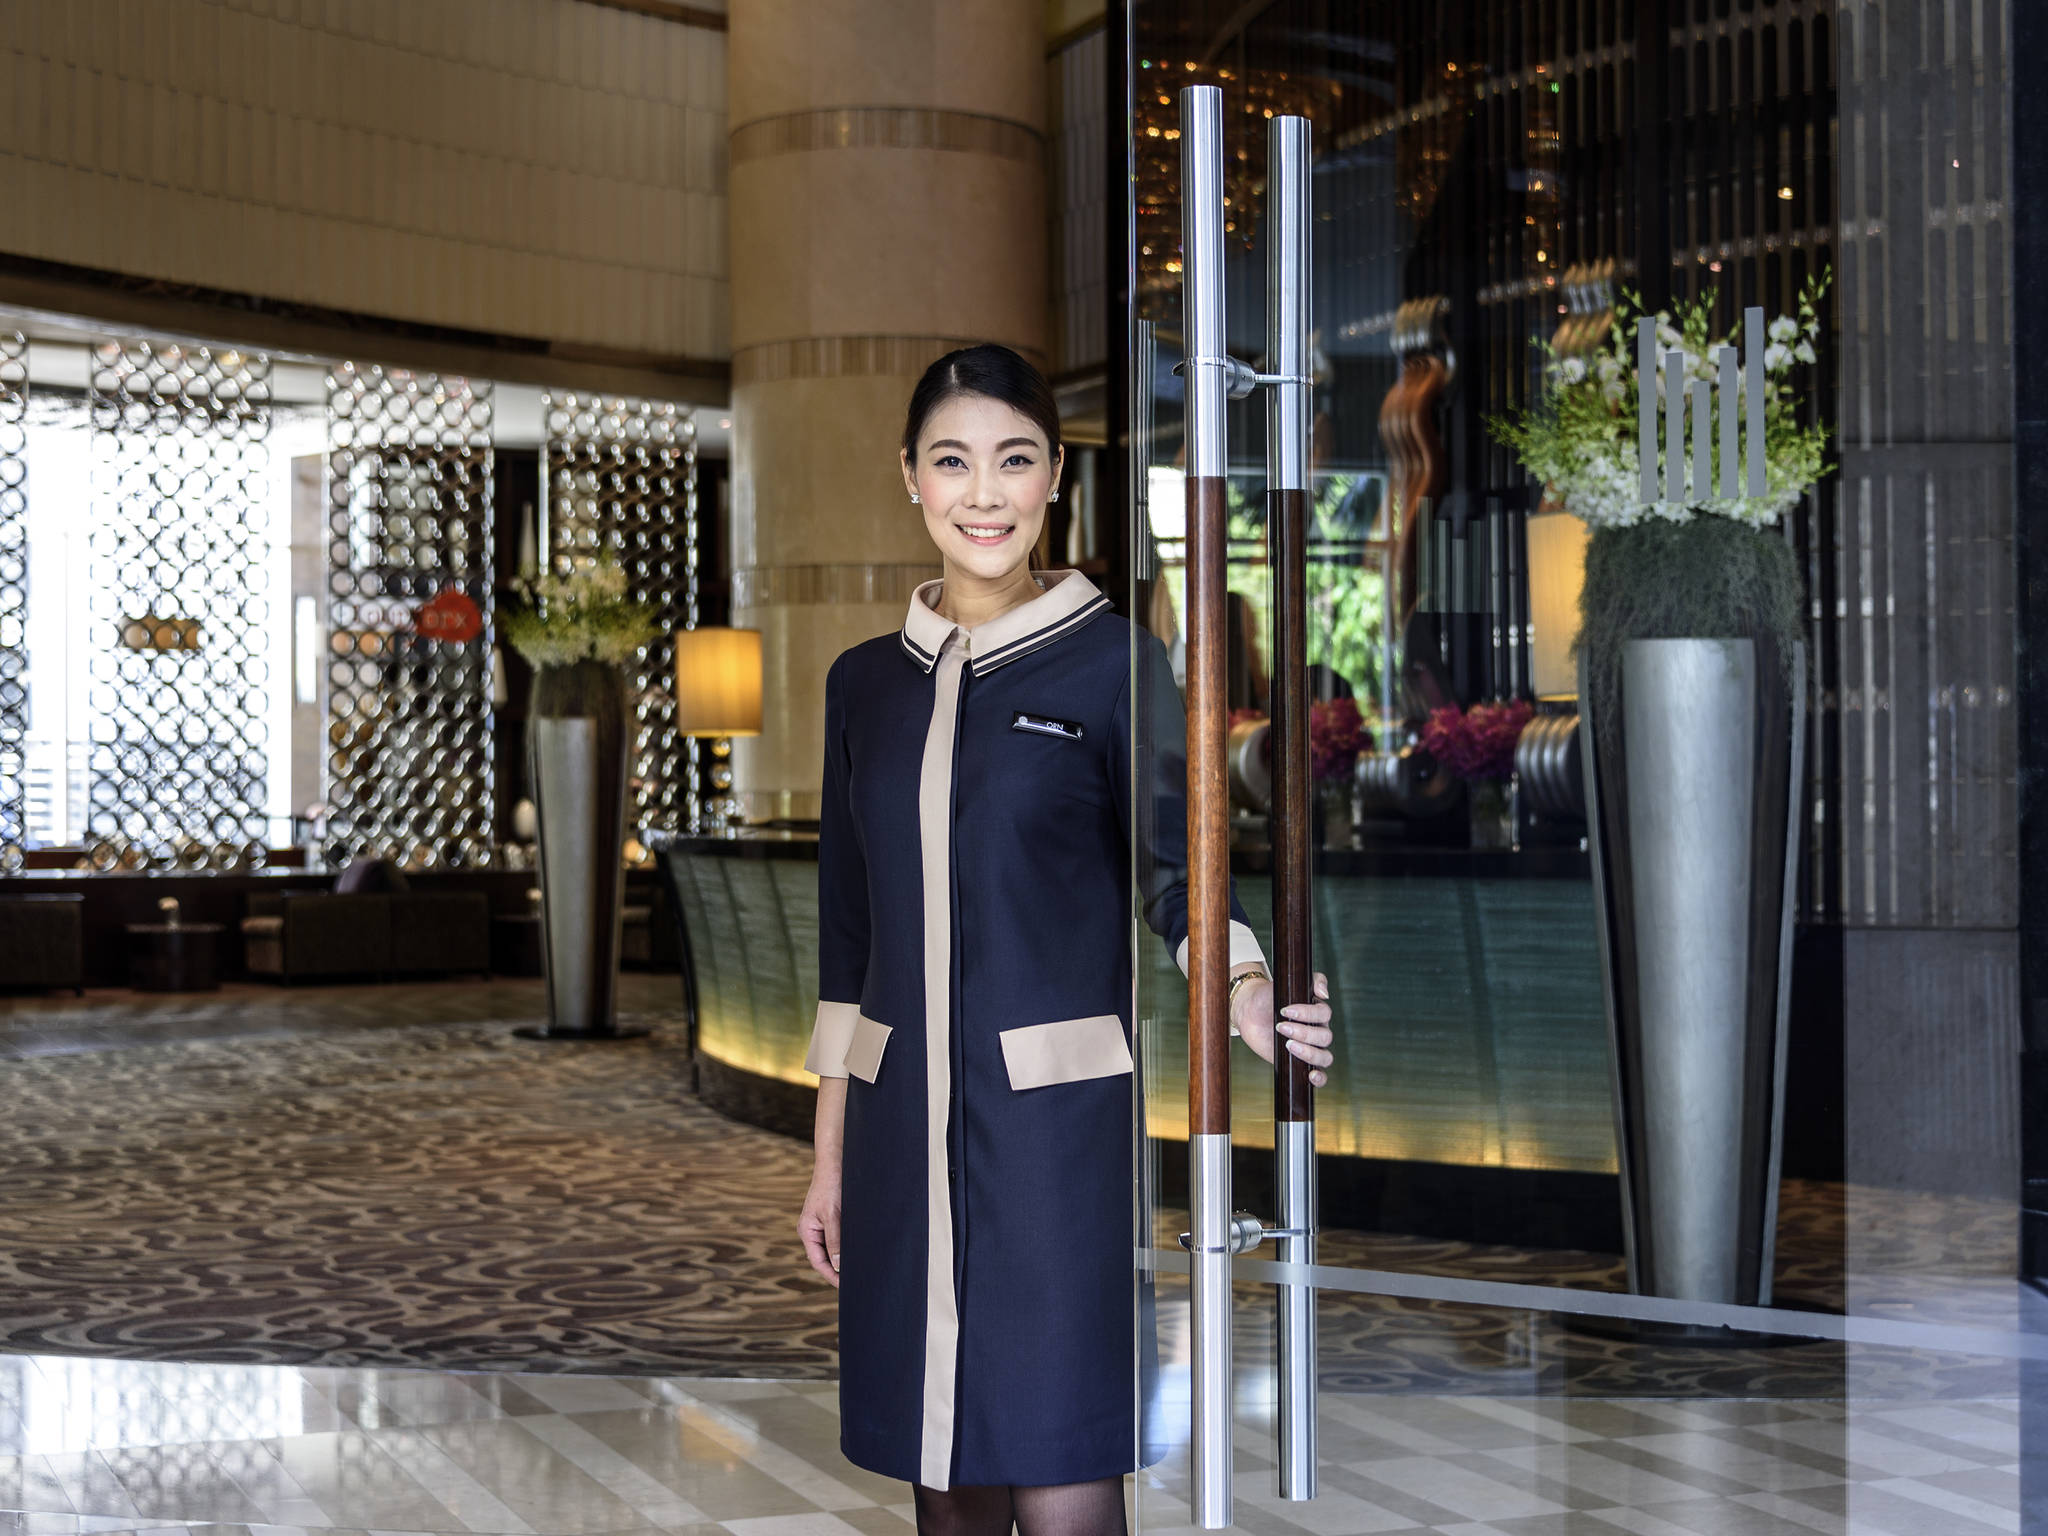 Hotel – Pullman Zhoushan Seaview (Opening October 2018)